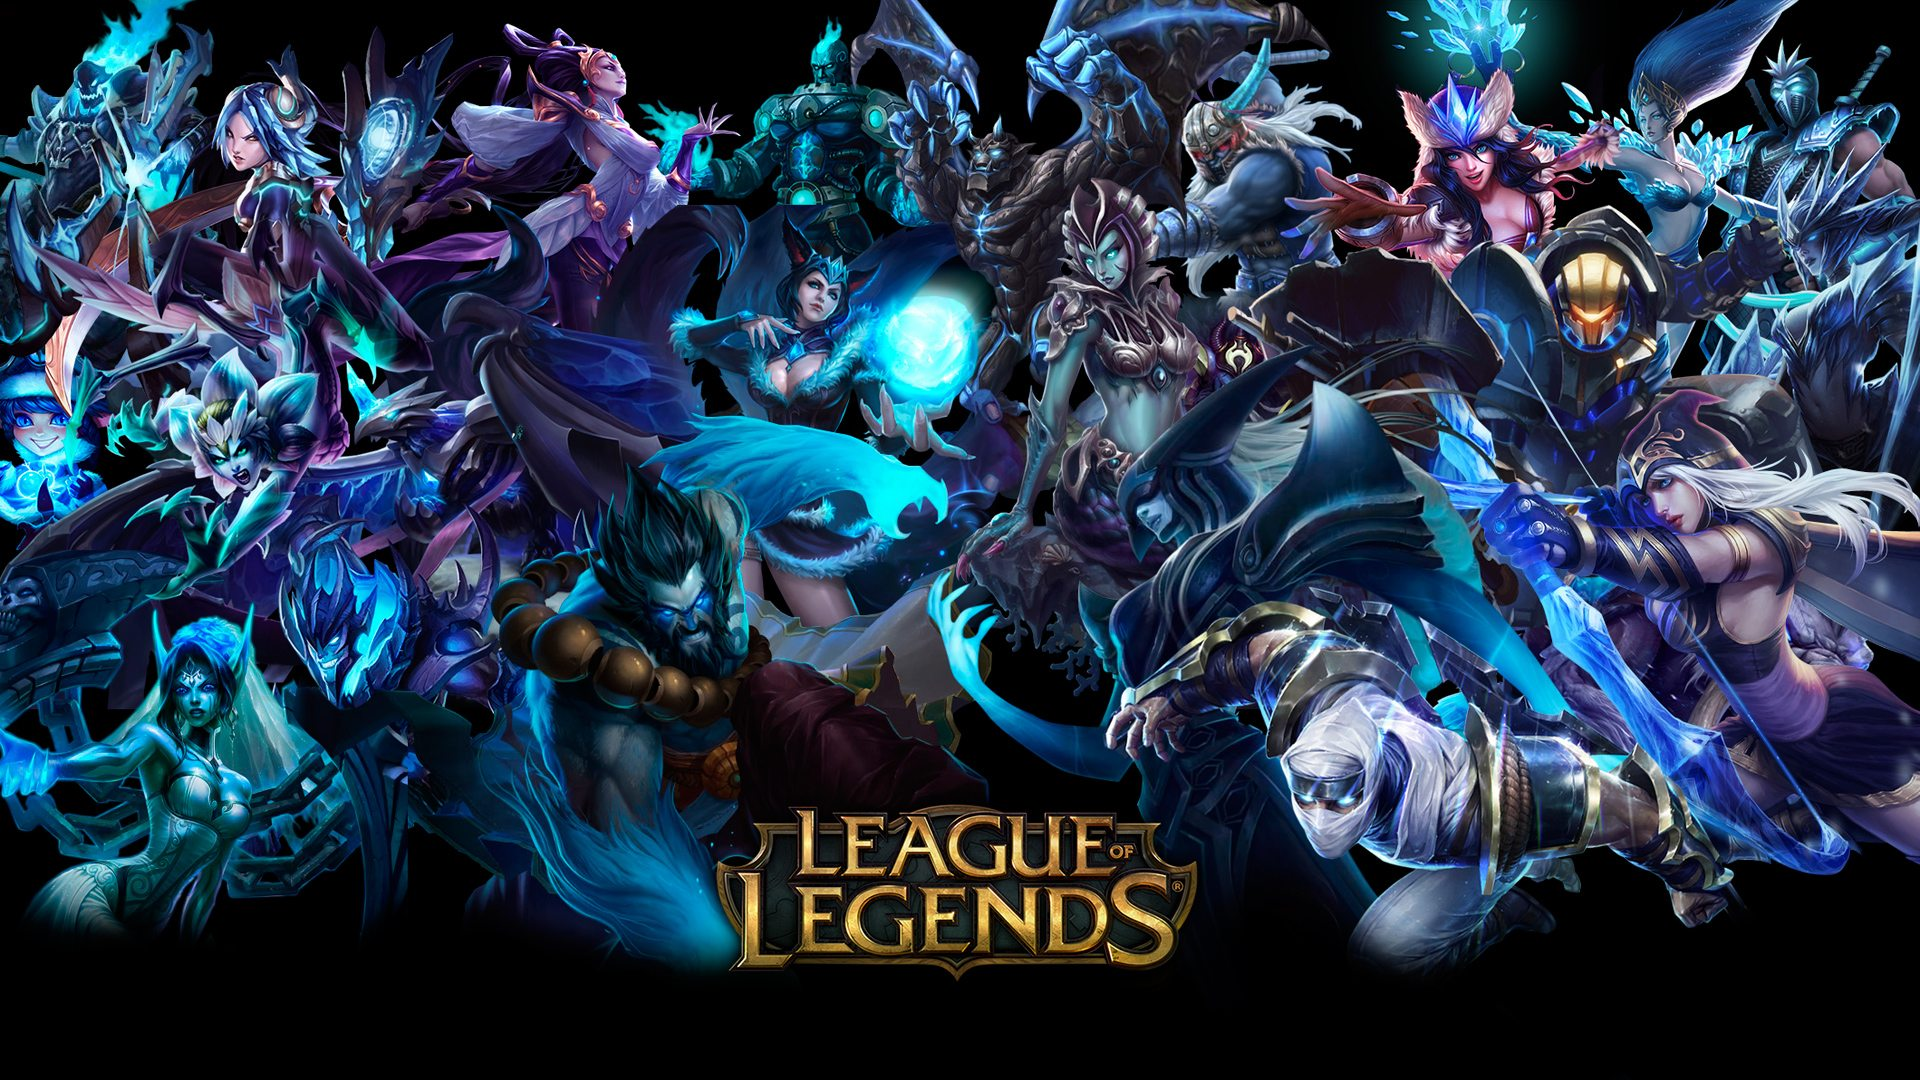 League Of Legends Wallpaper 19 1 So Japan